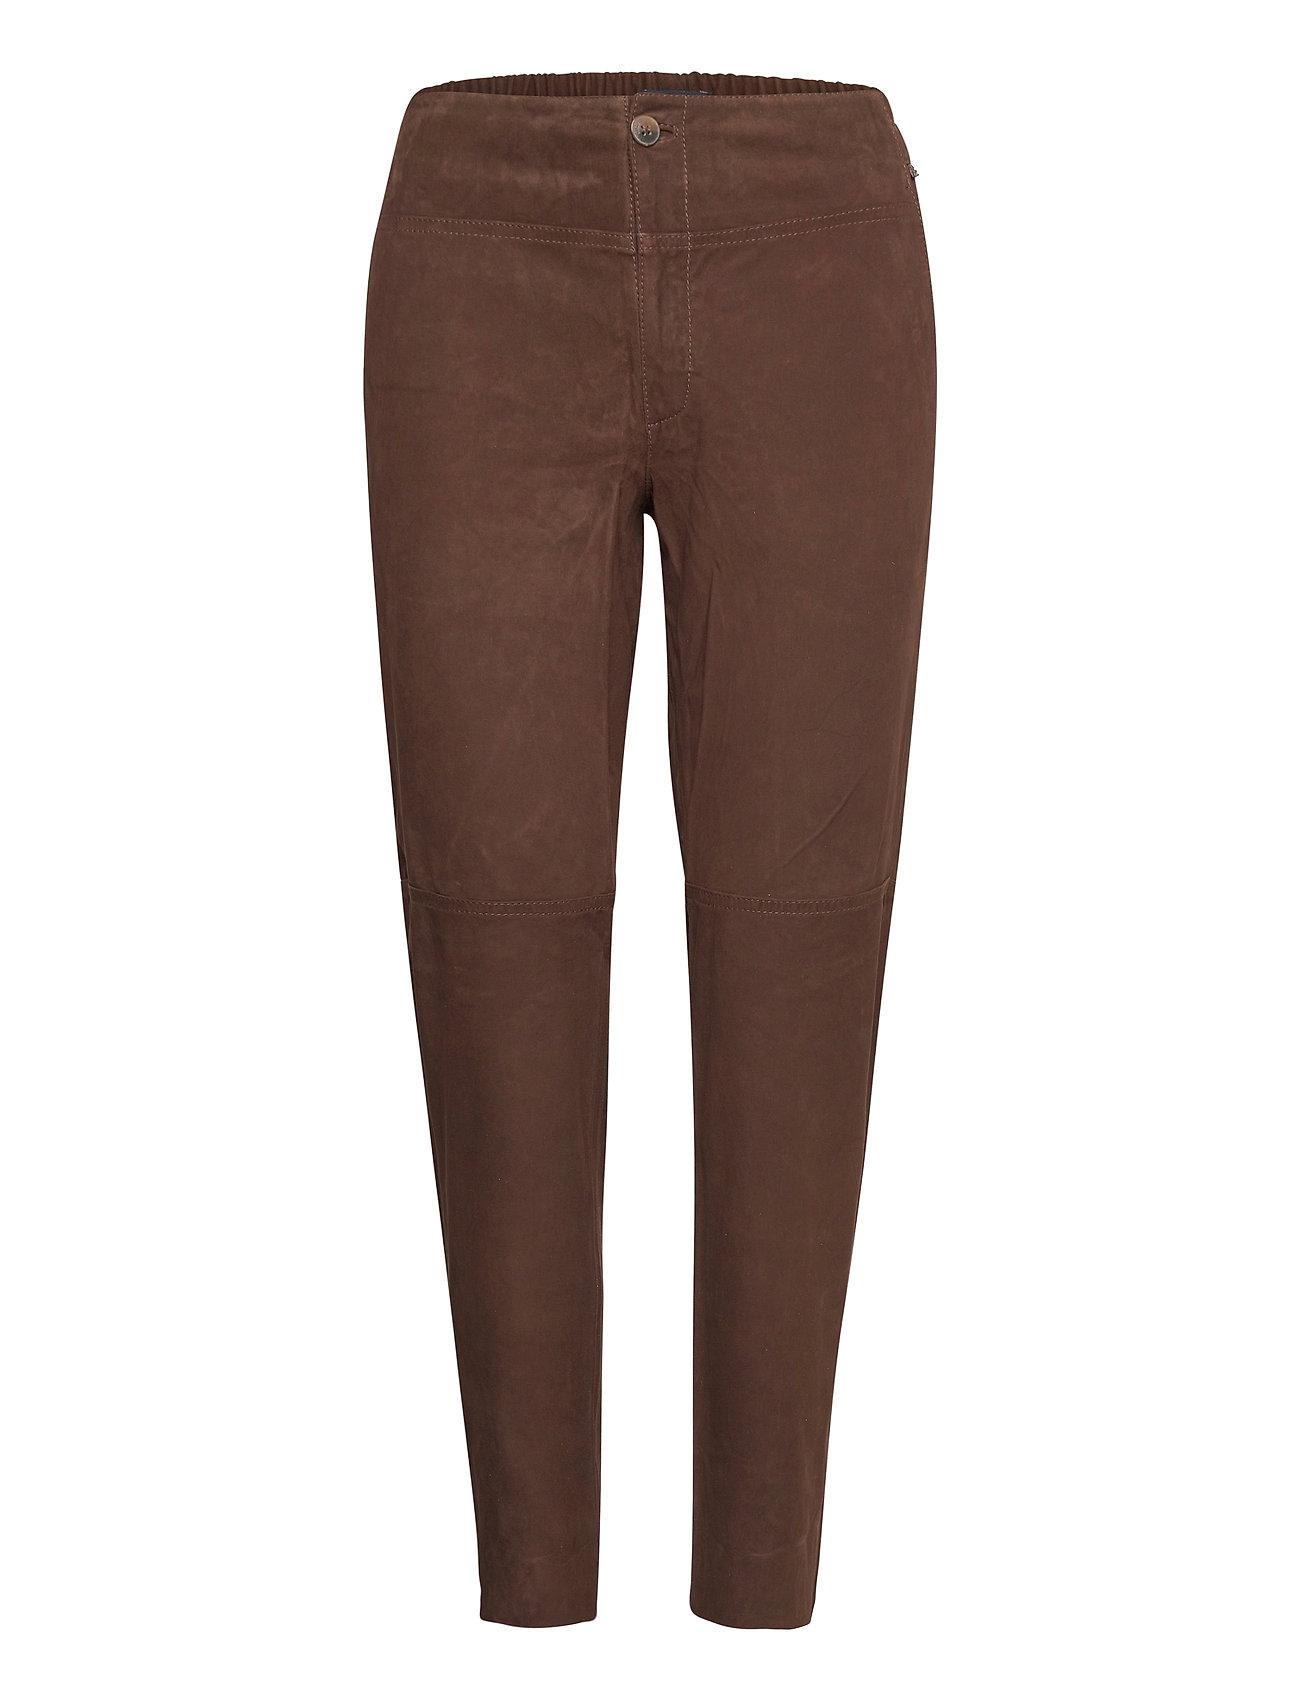 Olivia Suede Pants Leather Leggings/Bukser Brun Lexington Clothing